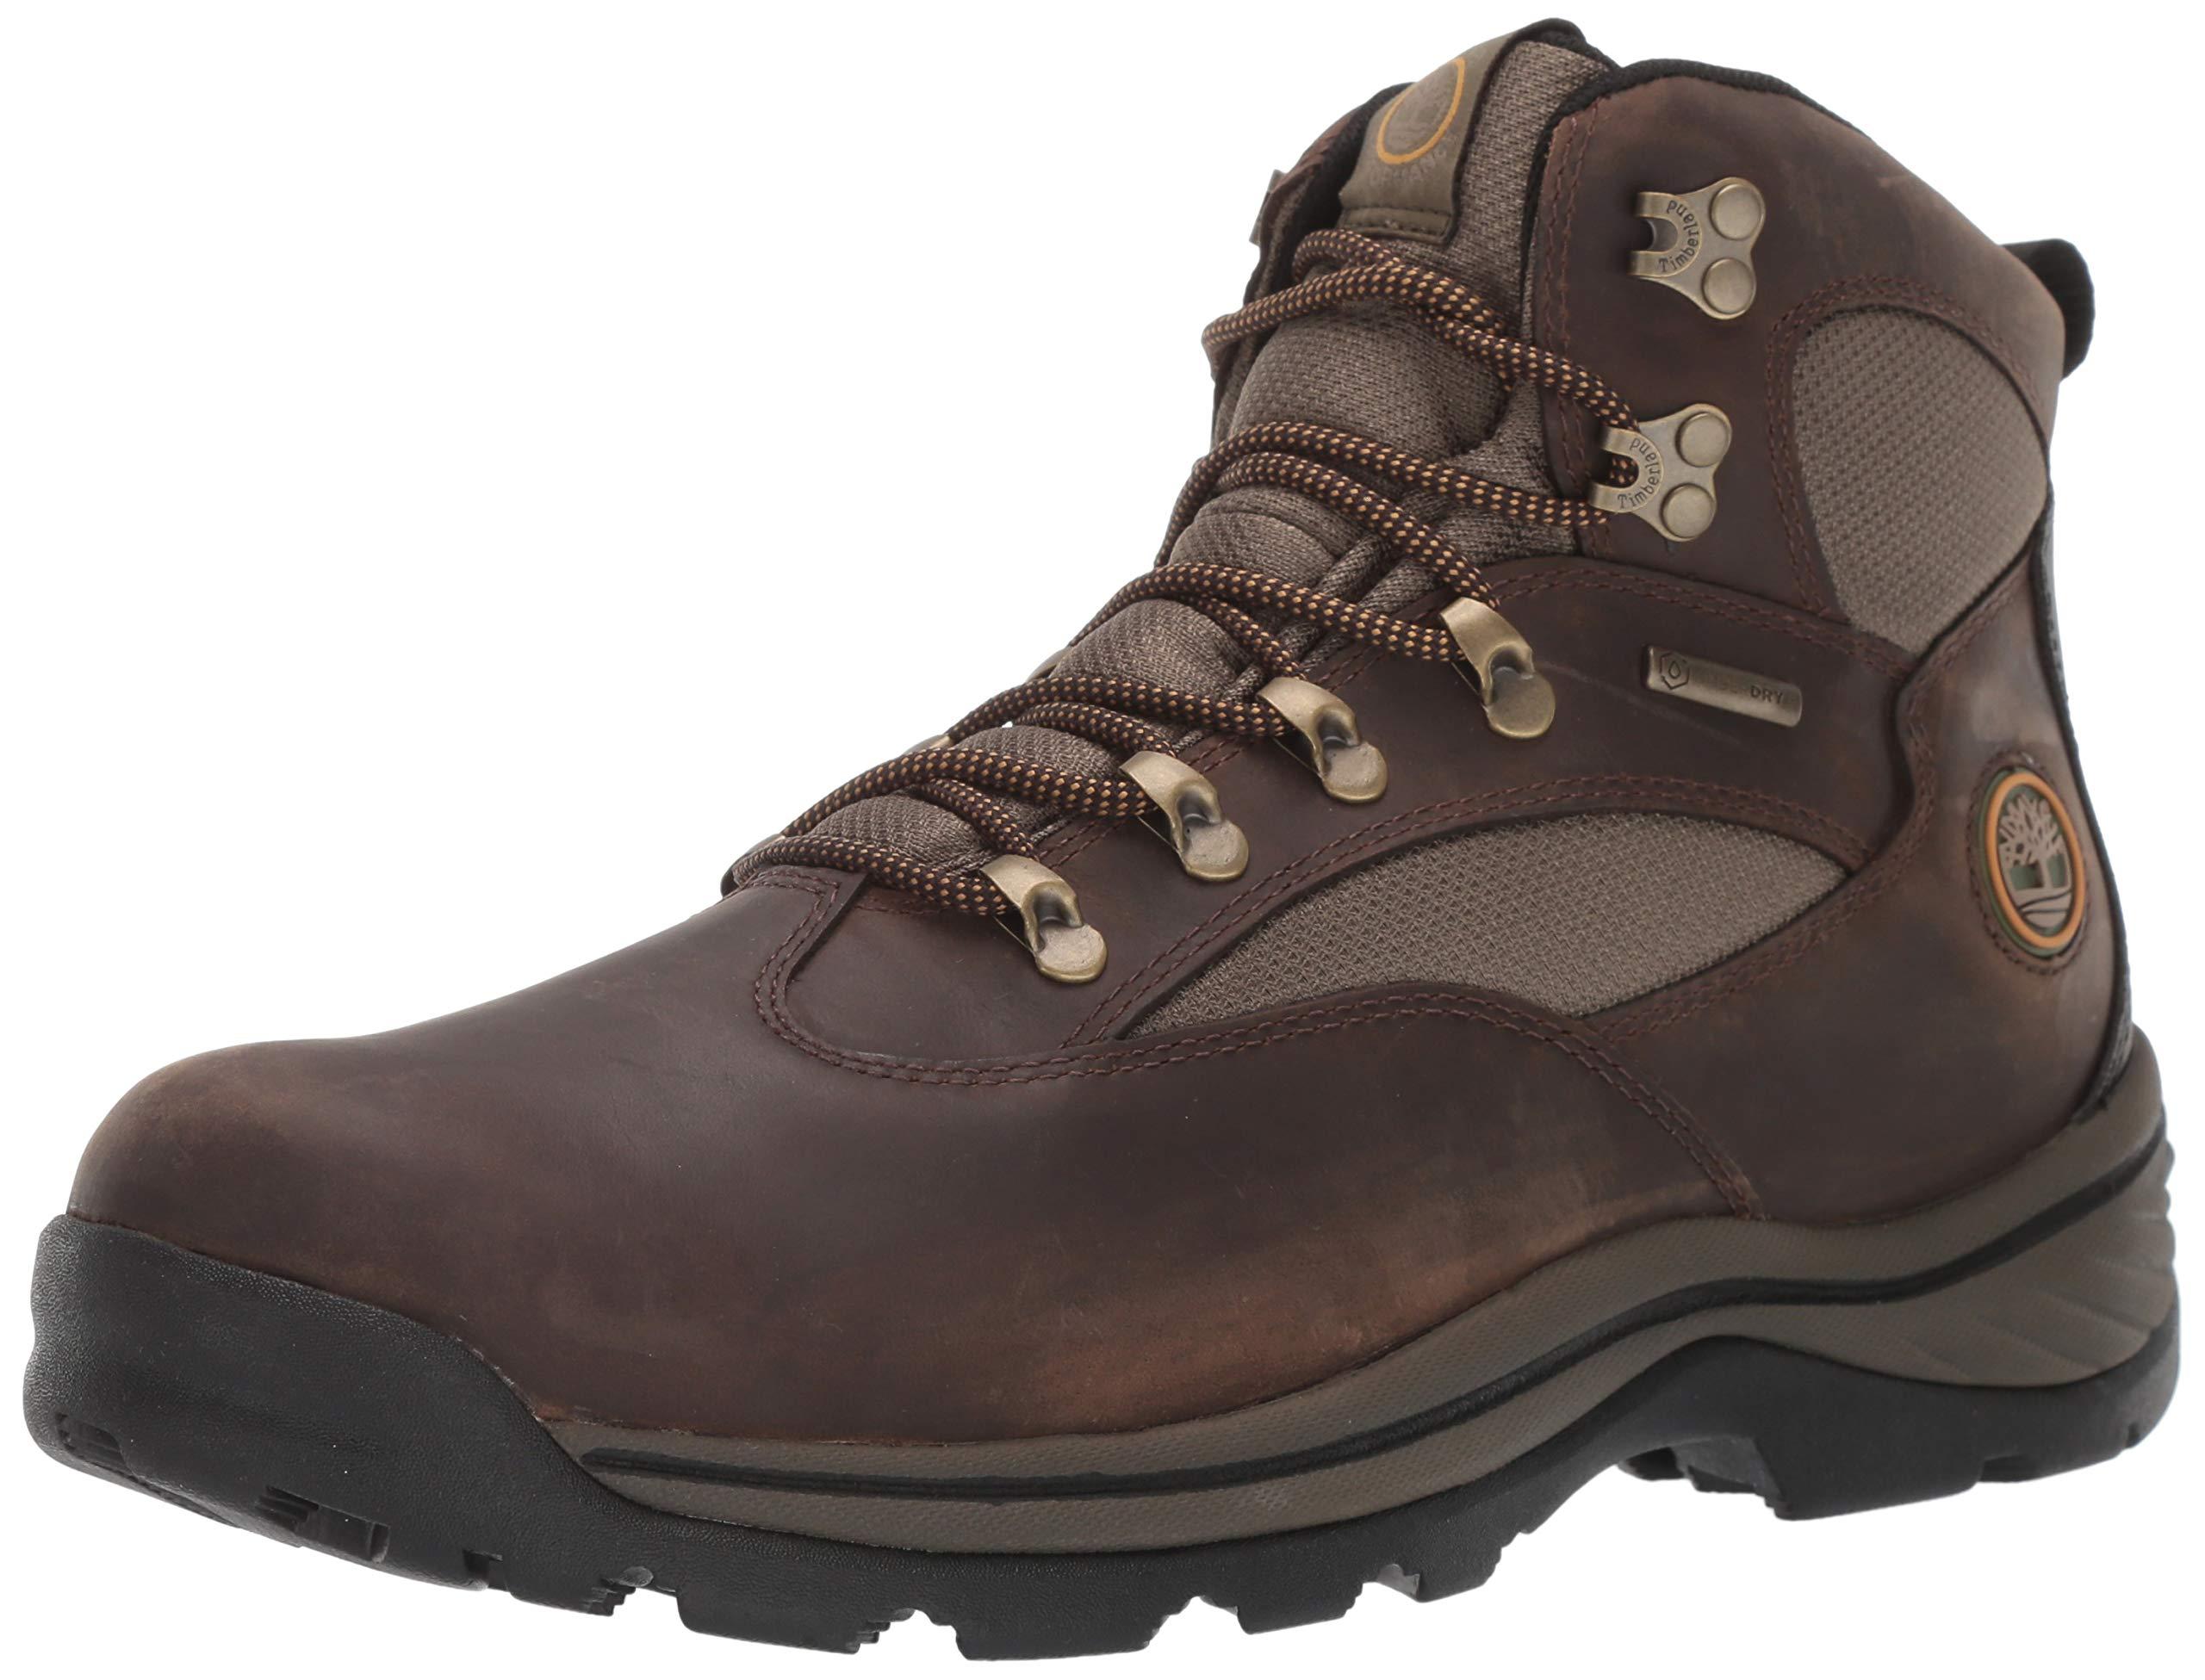 Timberland Men's Chocorua Trail Mid Waterproof, Brown/Green, 11 D-Medium